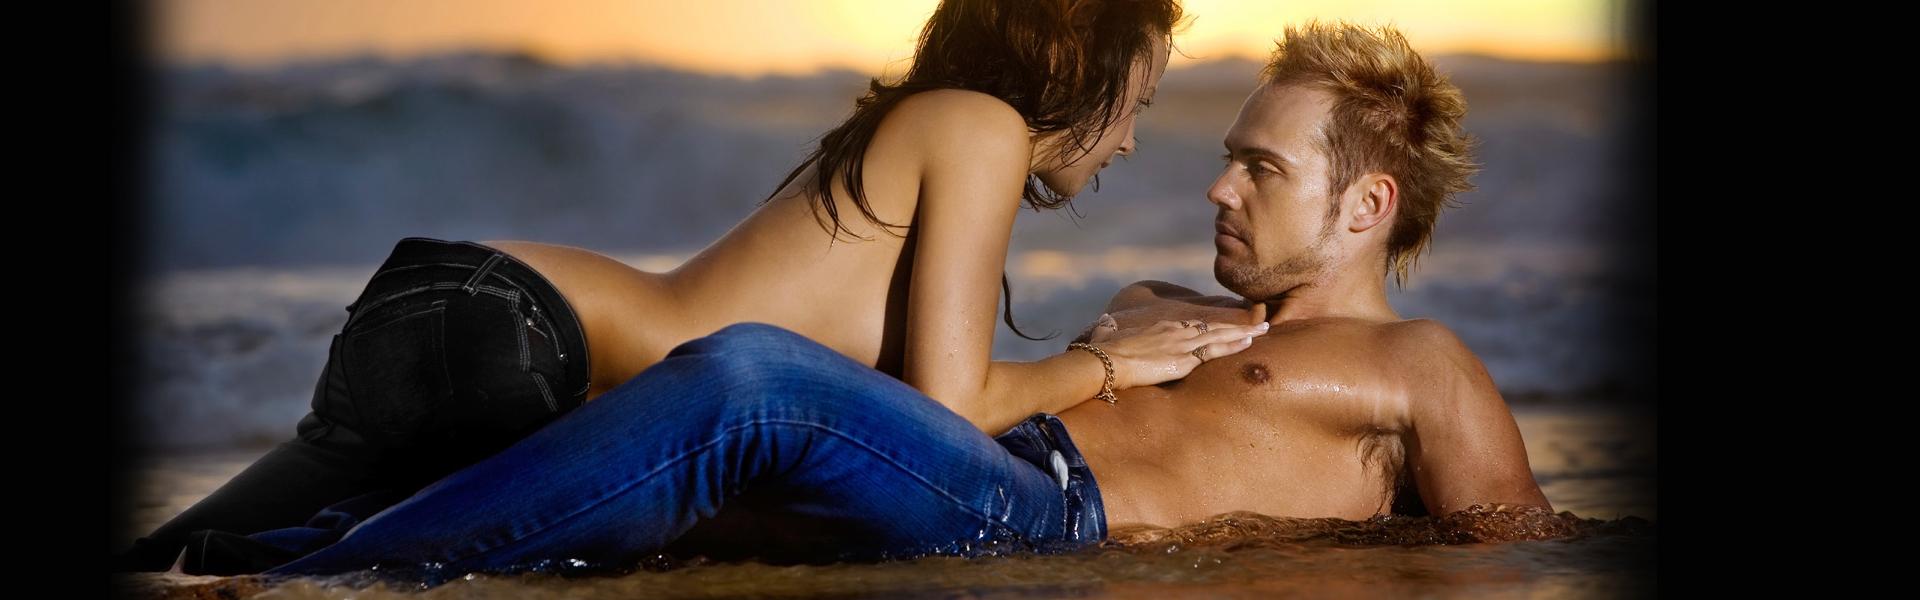 Sensual Massage in london, central London Sensual massage , sensual massage in central london